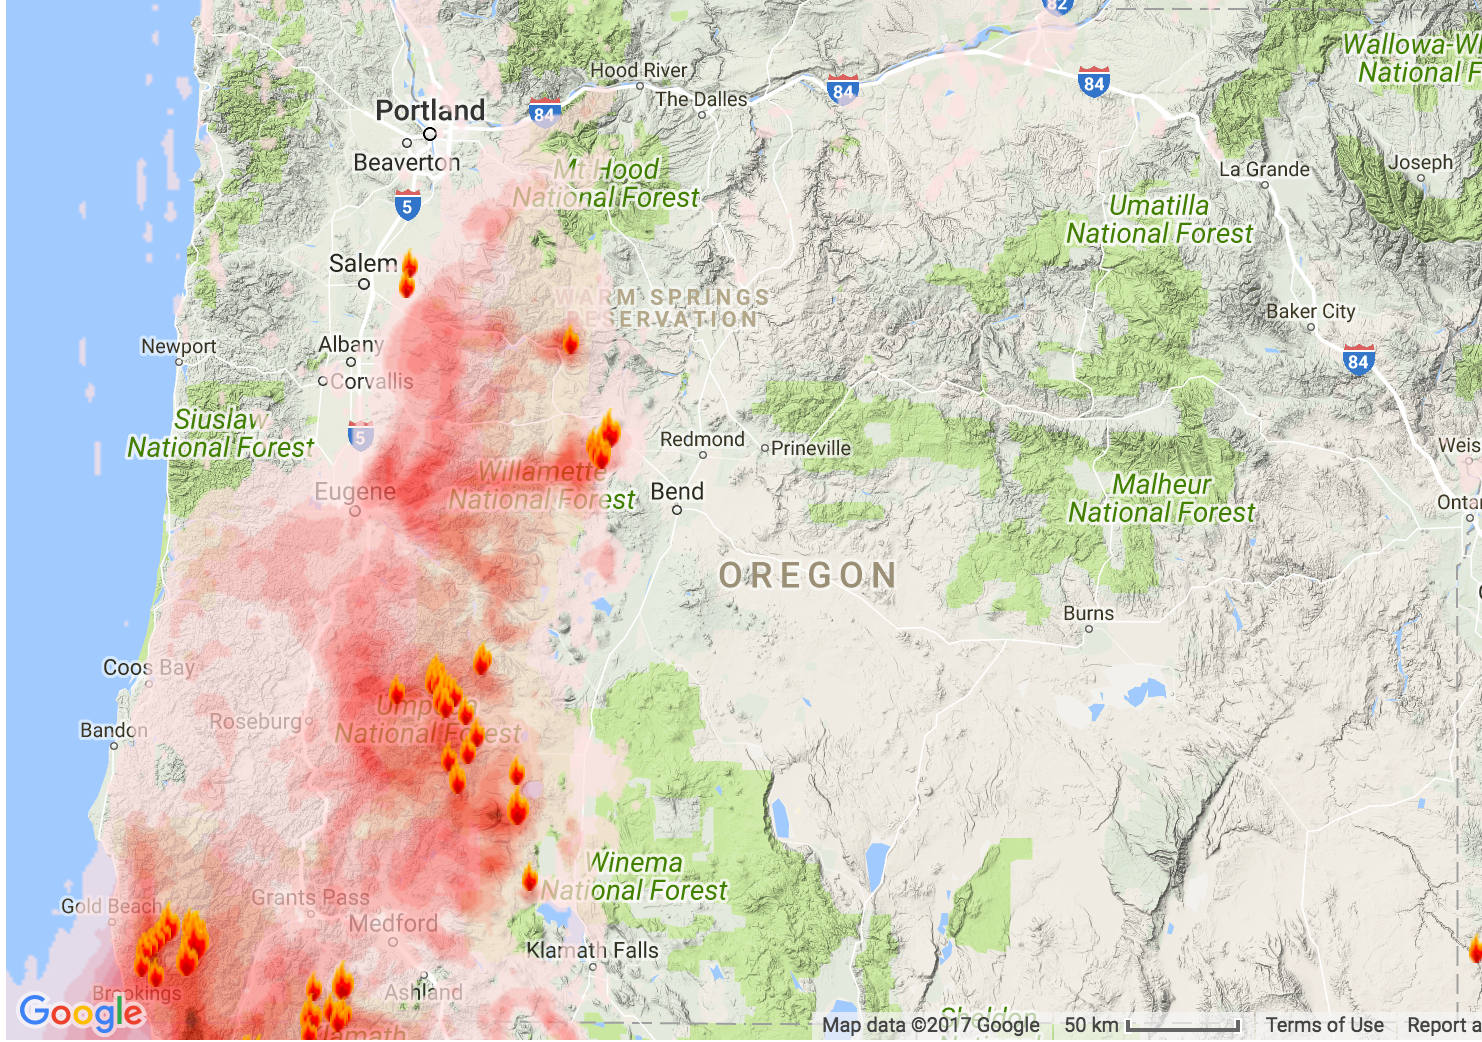 Oregon Smoke Information Oregon State Smoke Forecast For Aug 26 27